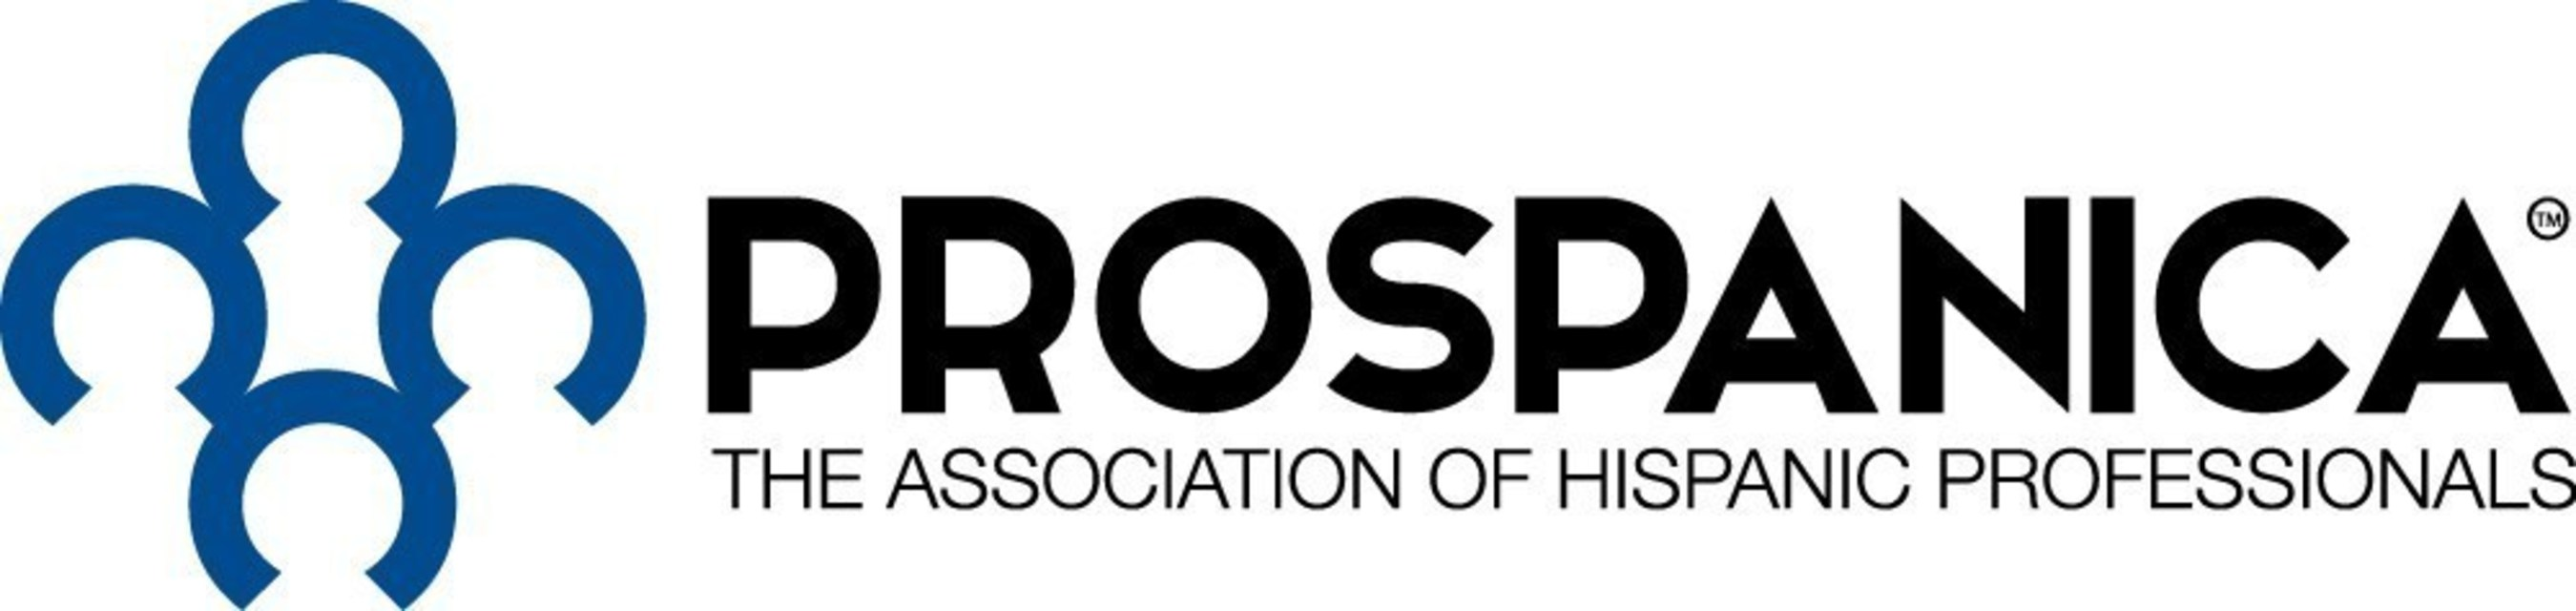 Prospanica Logo (PRNewsFoto/Prospanica)